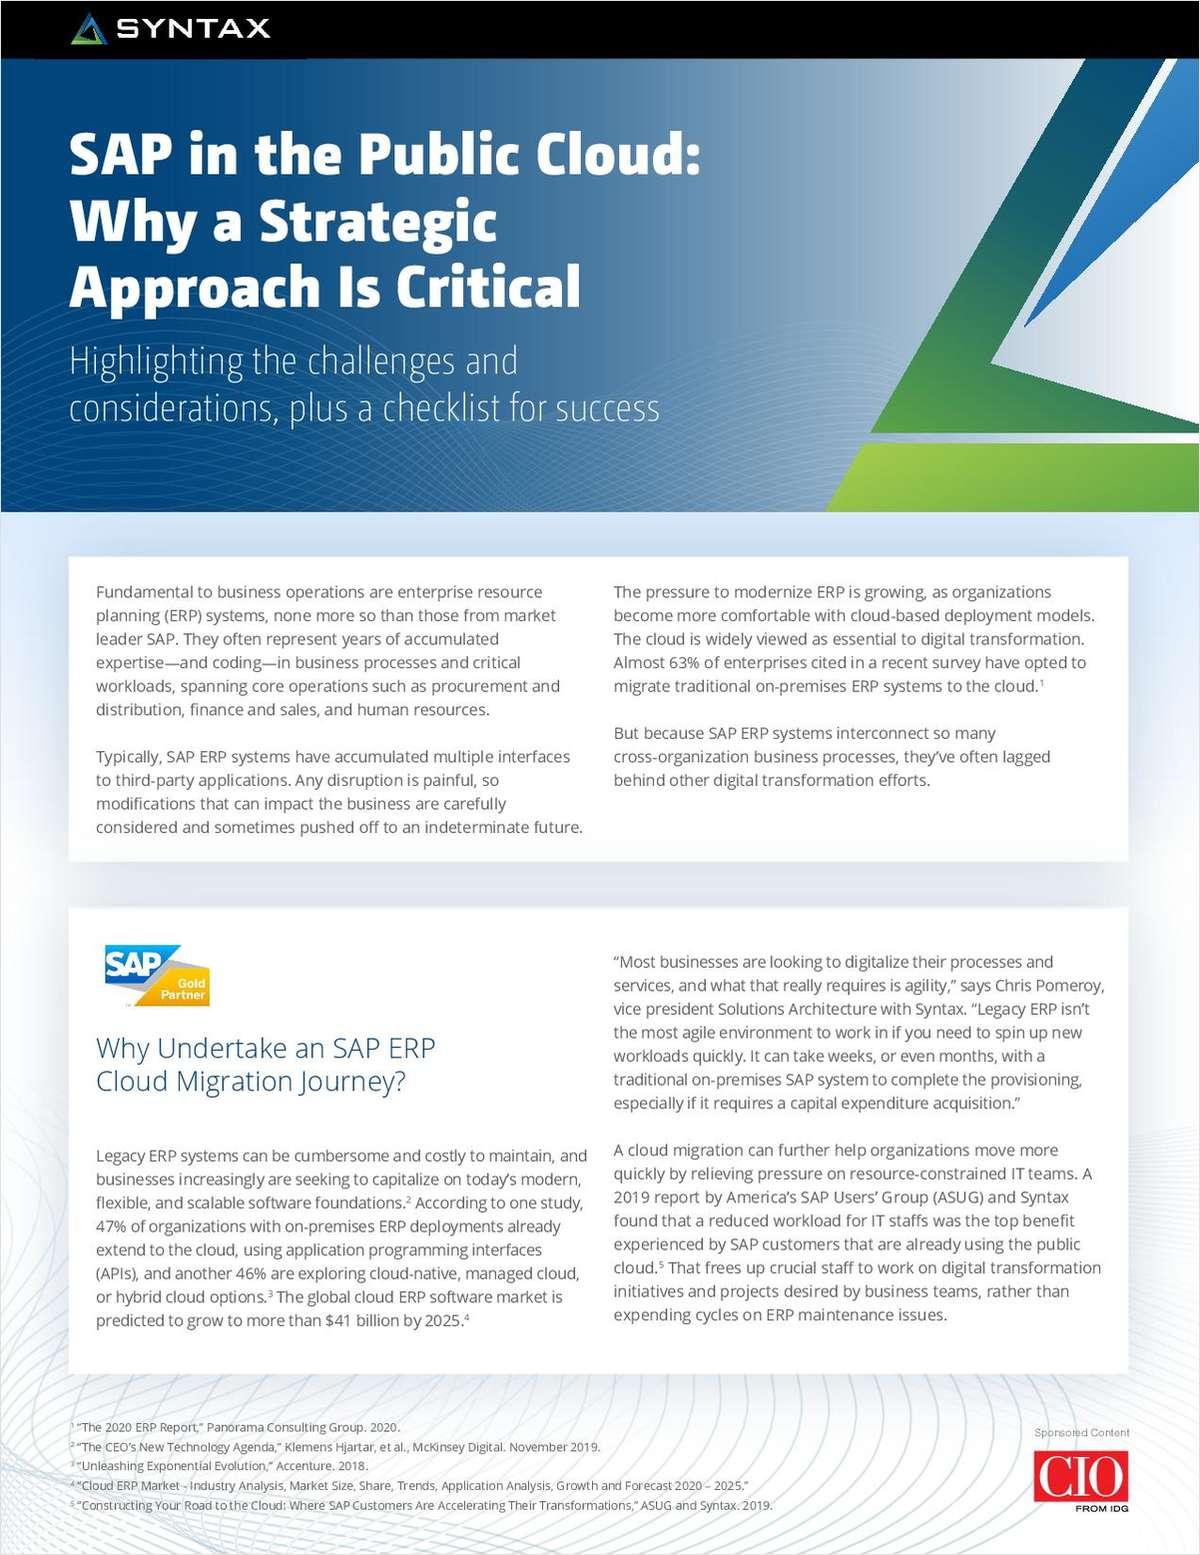 SAP in the Public Cloud: Why a Strategic Approach is Critical